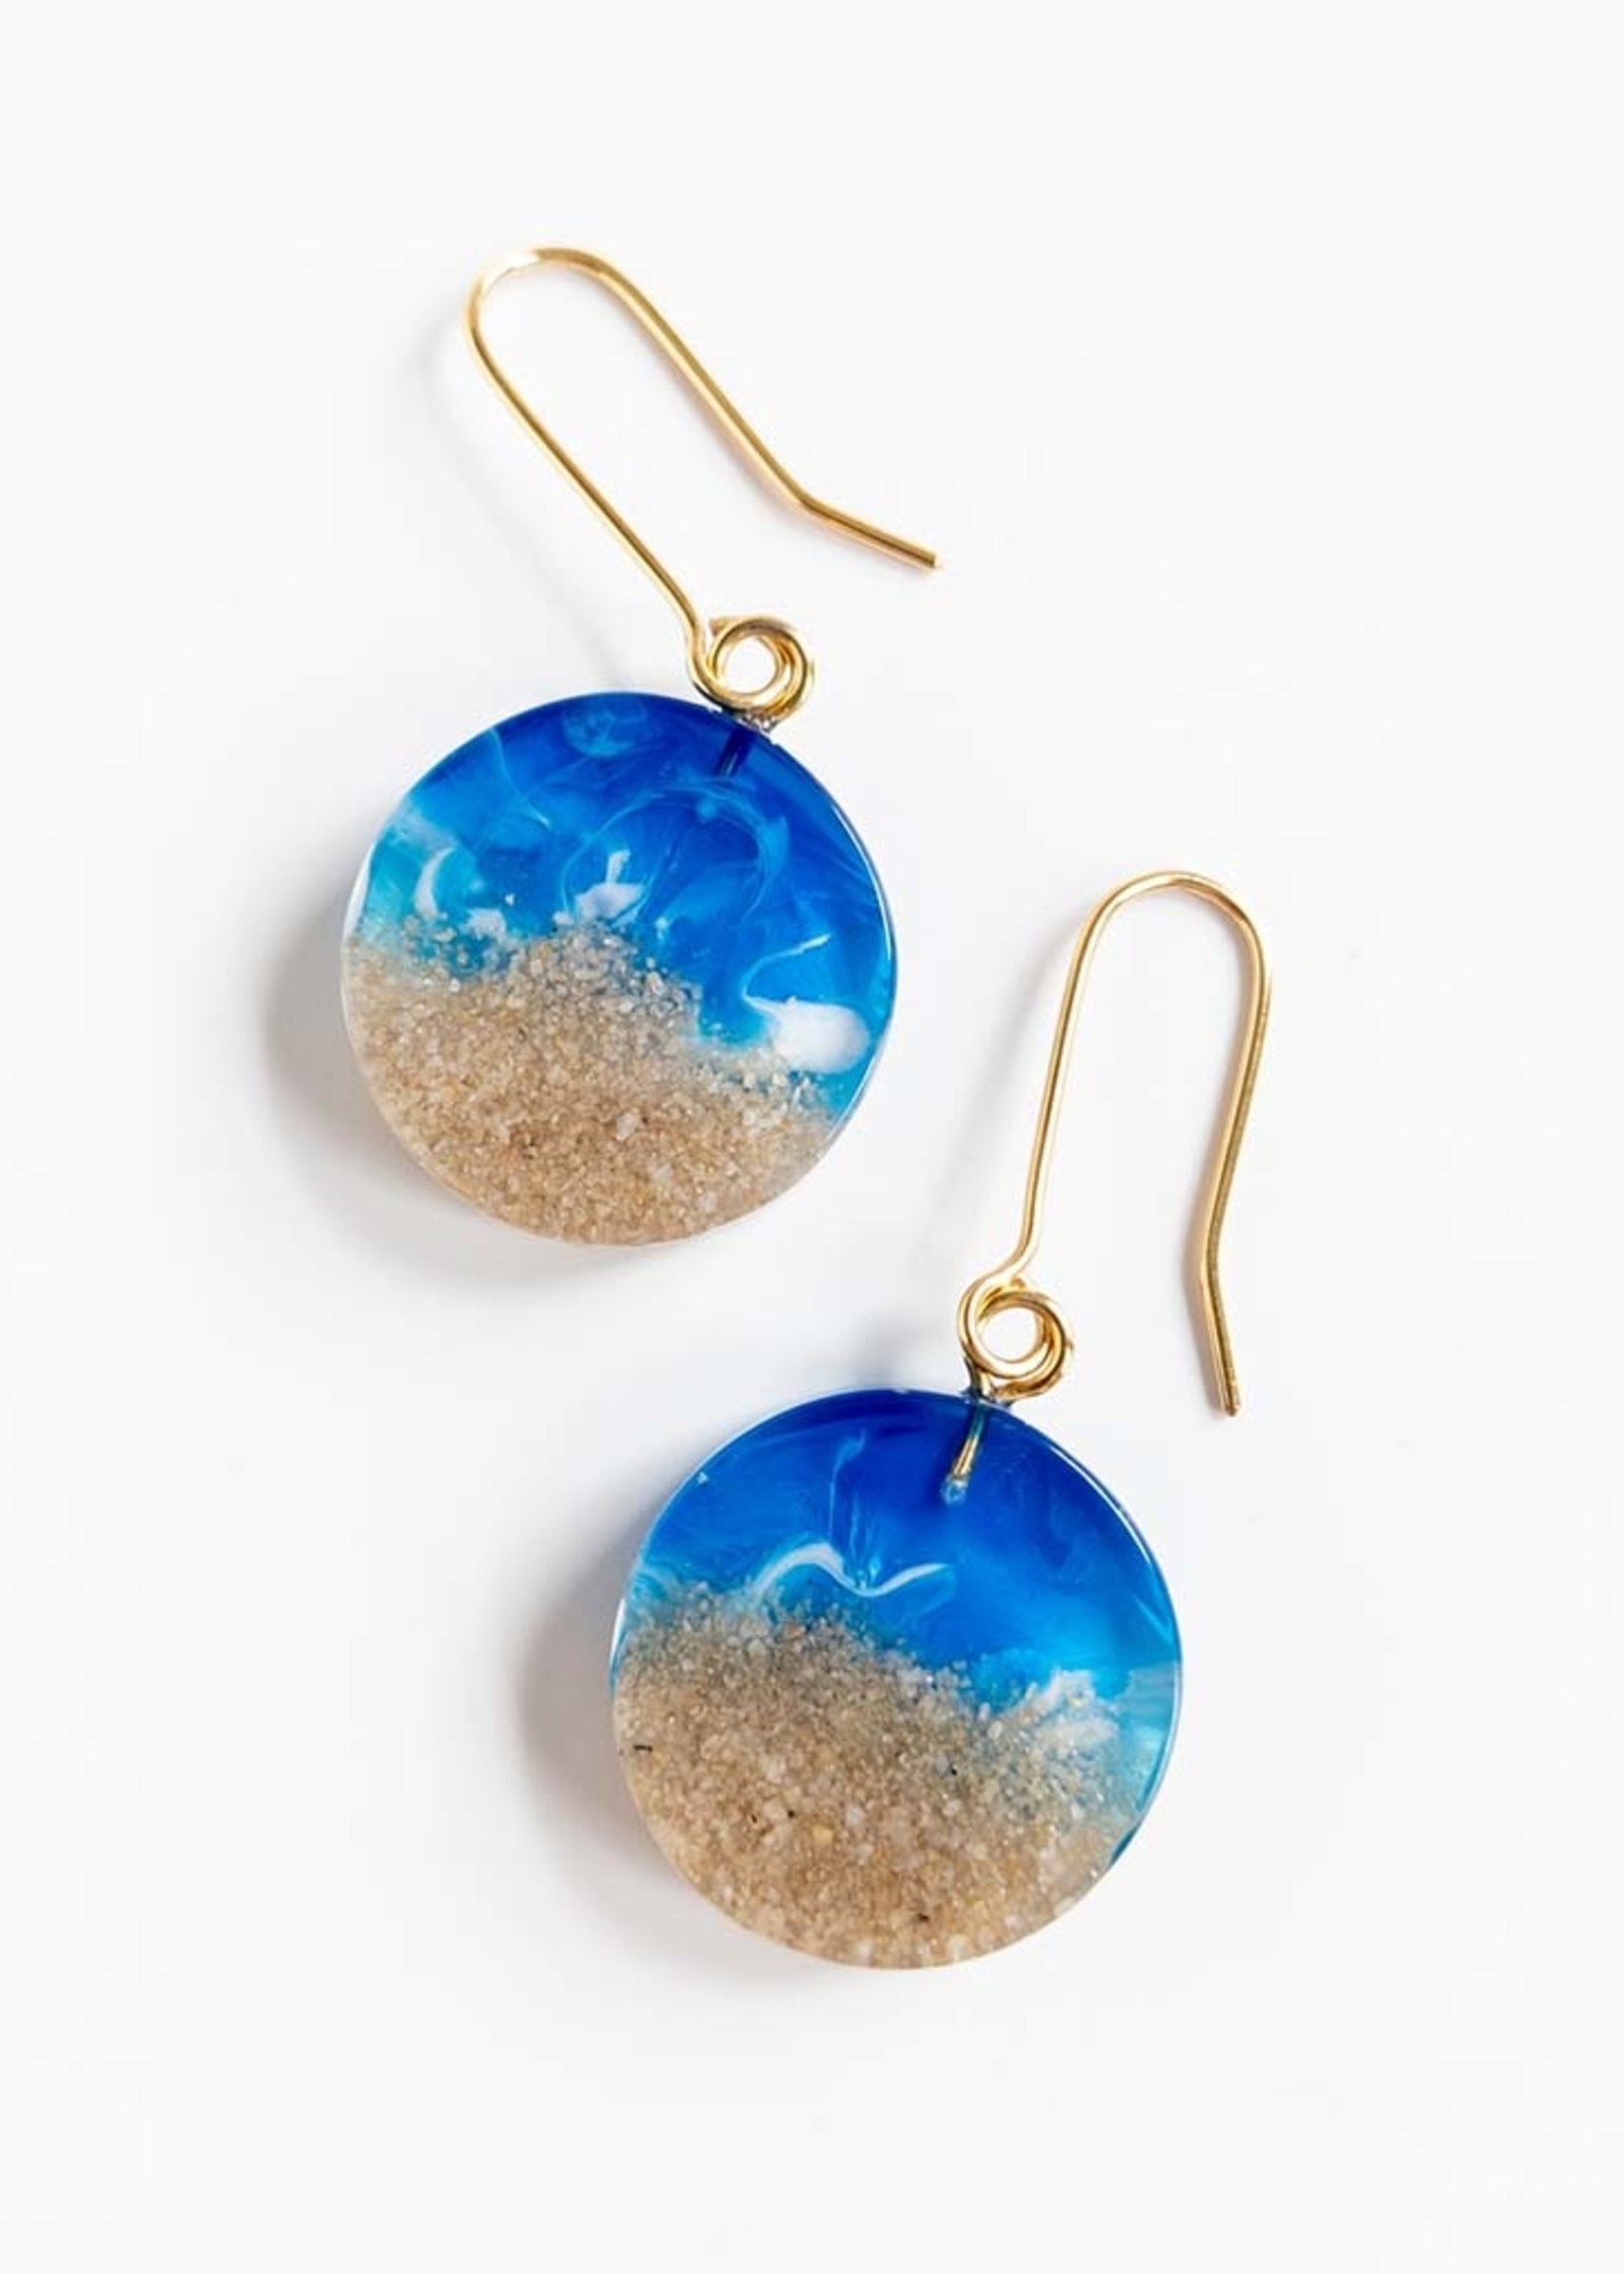 Belart Ocean Earrings